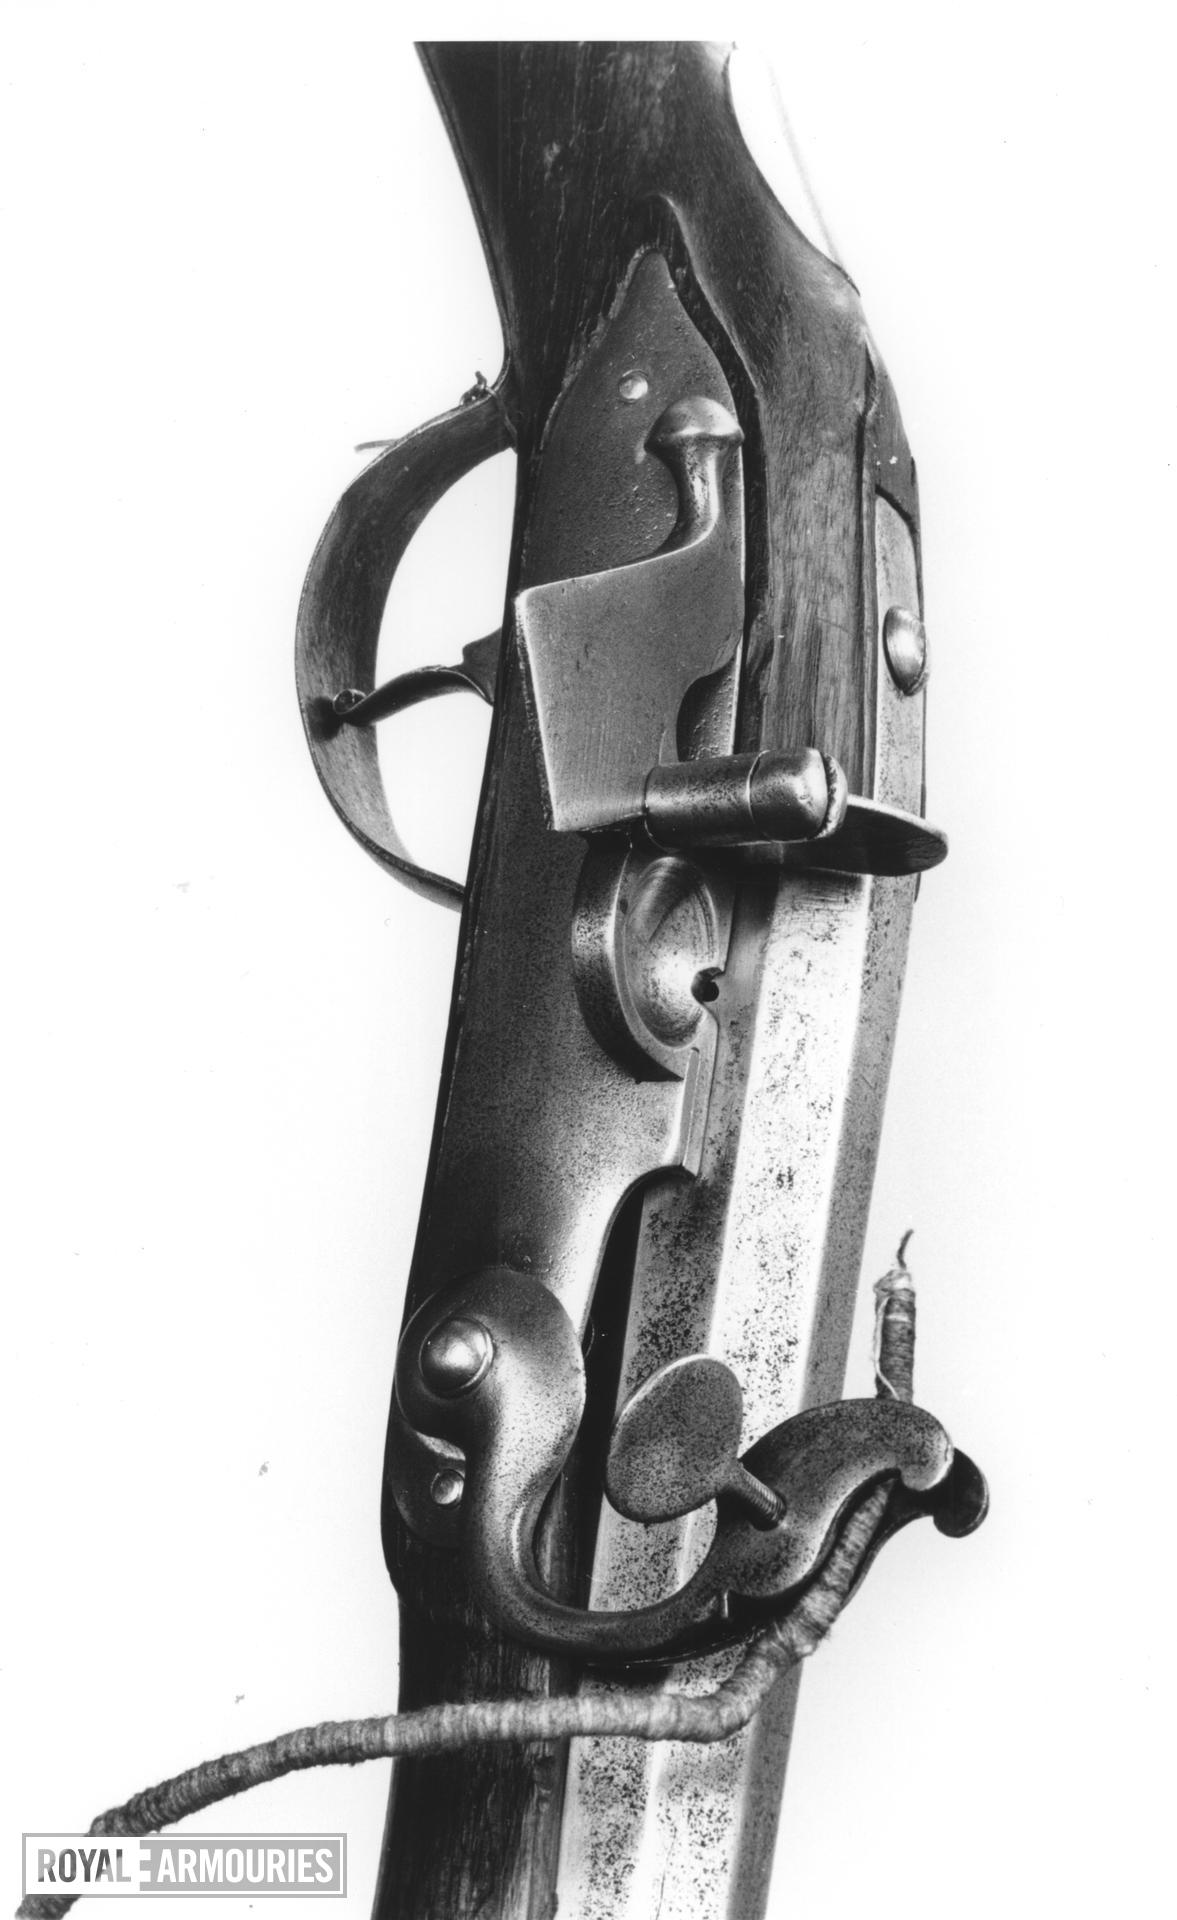 Matchlock muzzle-loading musket - Service Type